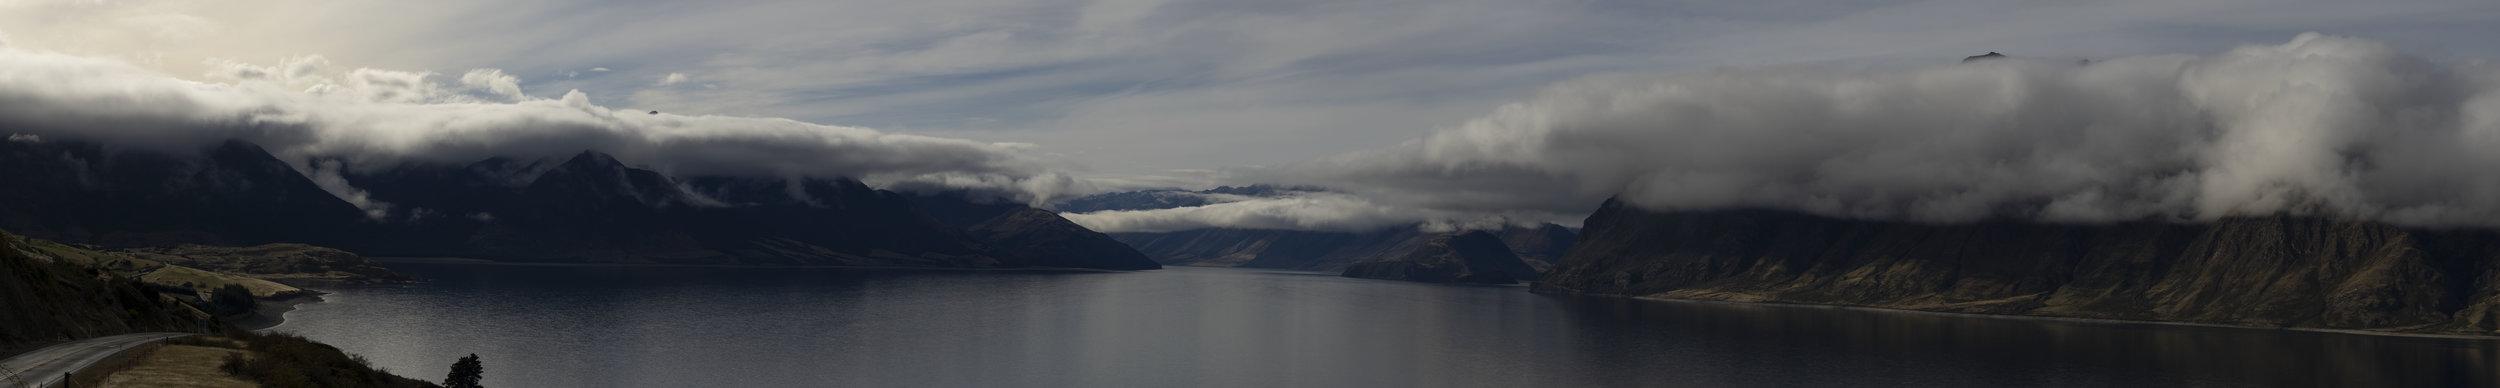 Lake Pukaki, Mount Cook. New Zealand, 2017.